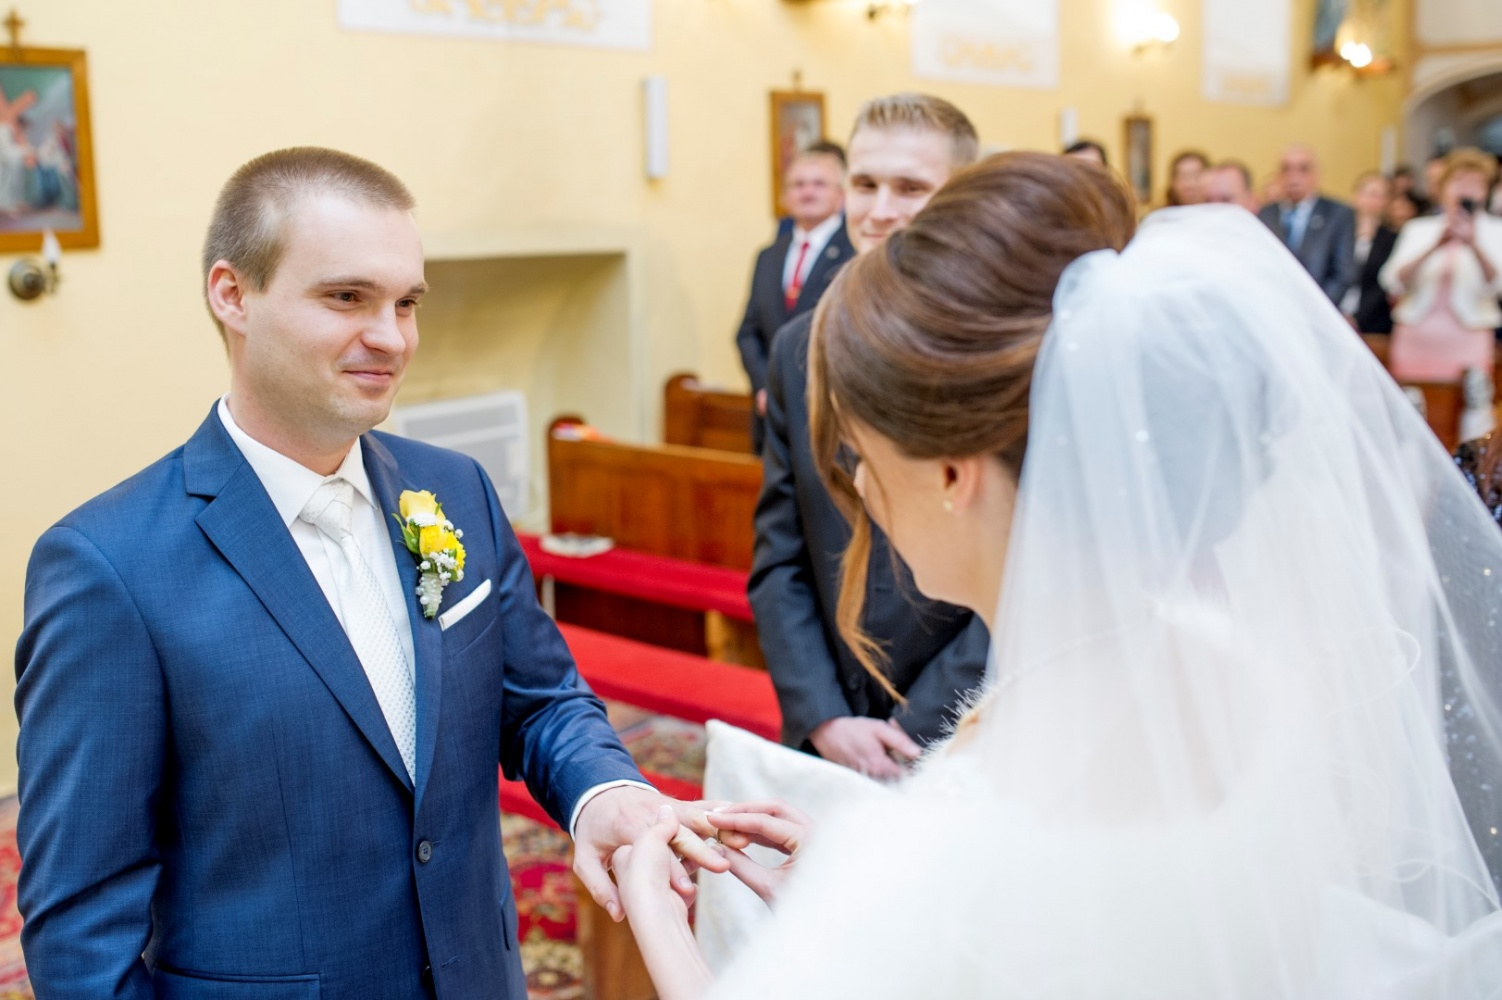 http://www.fotoz.sk/images/gallery-23/normal/svadba-_sv_petrus-vini_053.jpg